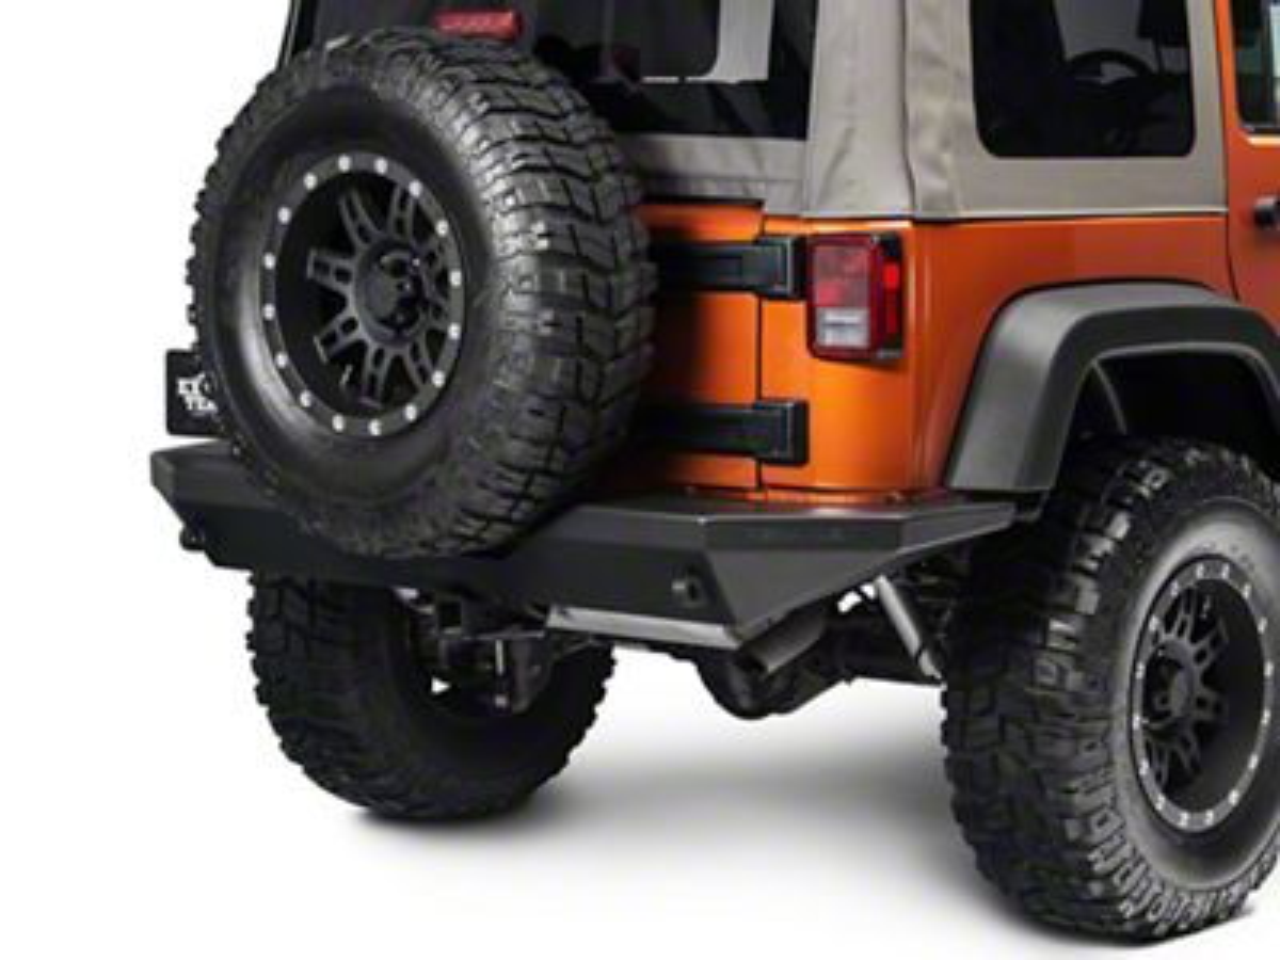 Teraflex RockGuard Outback Rear Bumper (07-18 Jeep Wrangler JK)